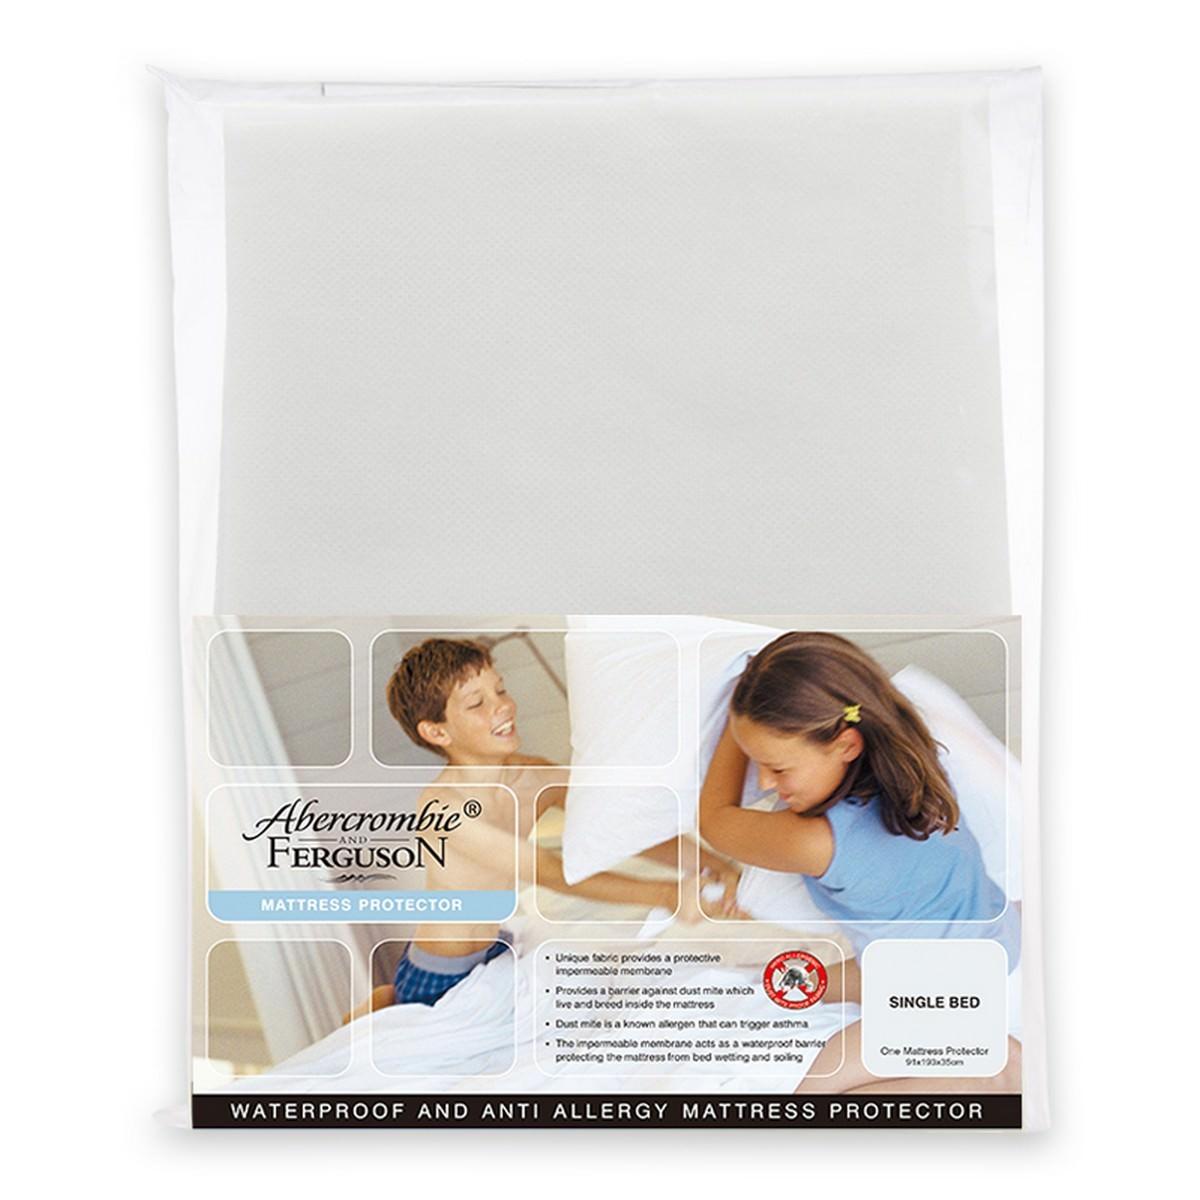 Abercrombie & Ferguson Waterproof Anti-Allergy Microfibre Mattress Protector, Double